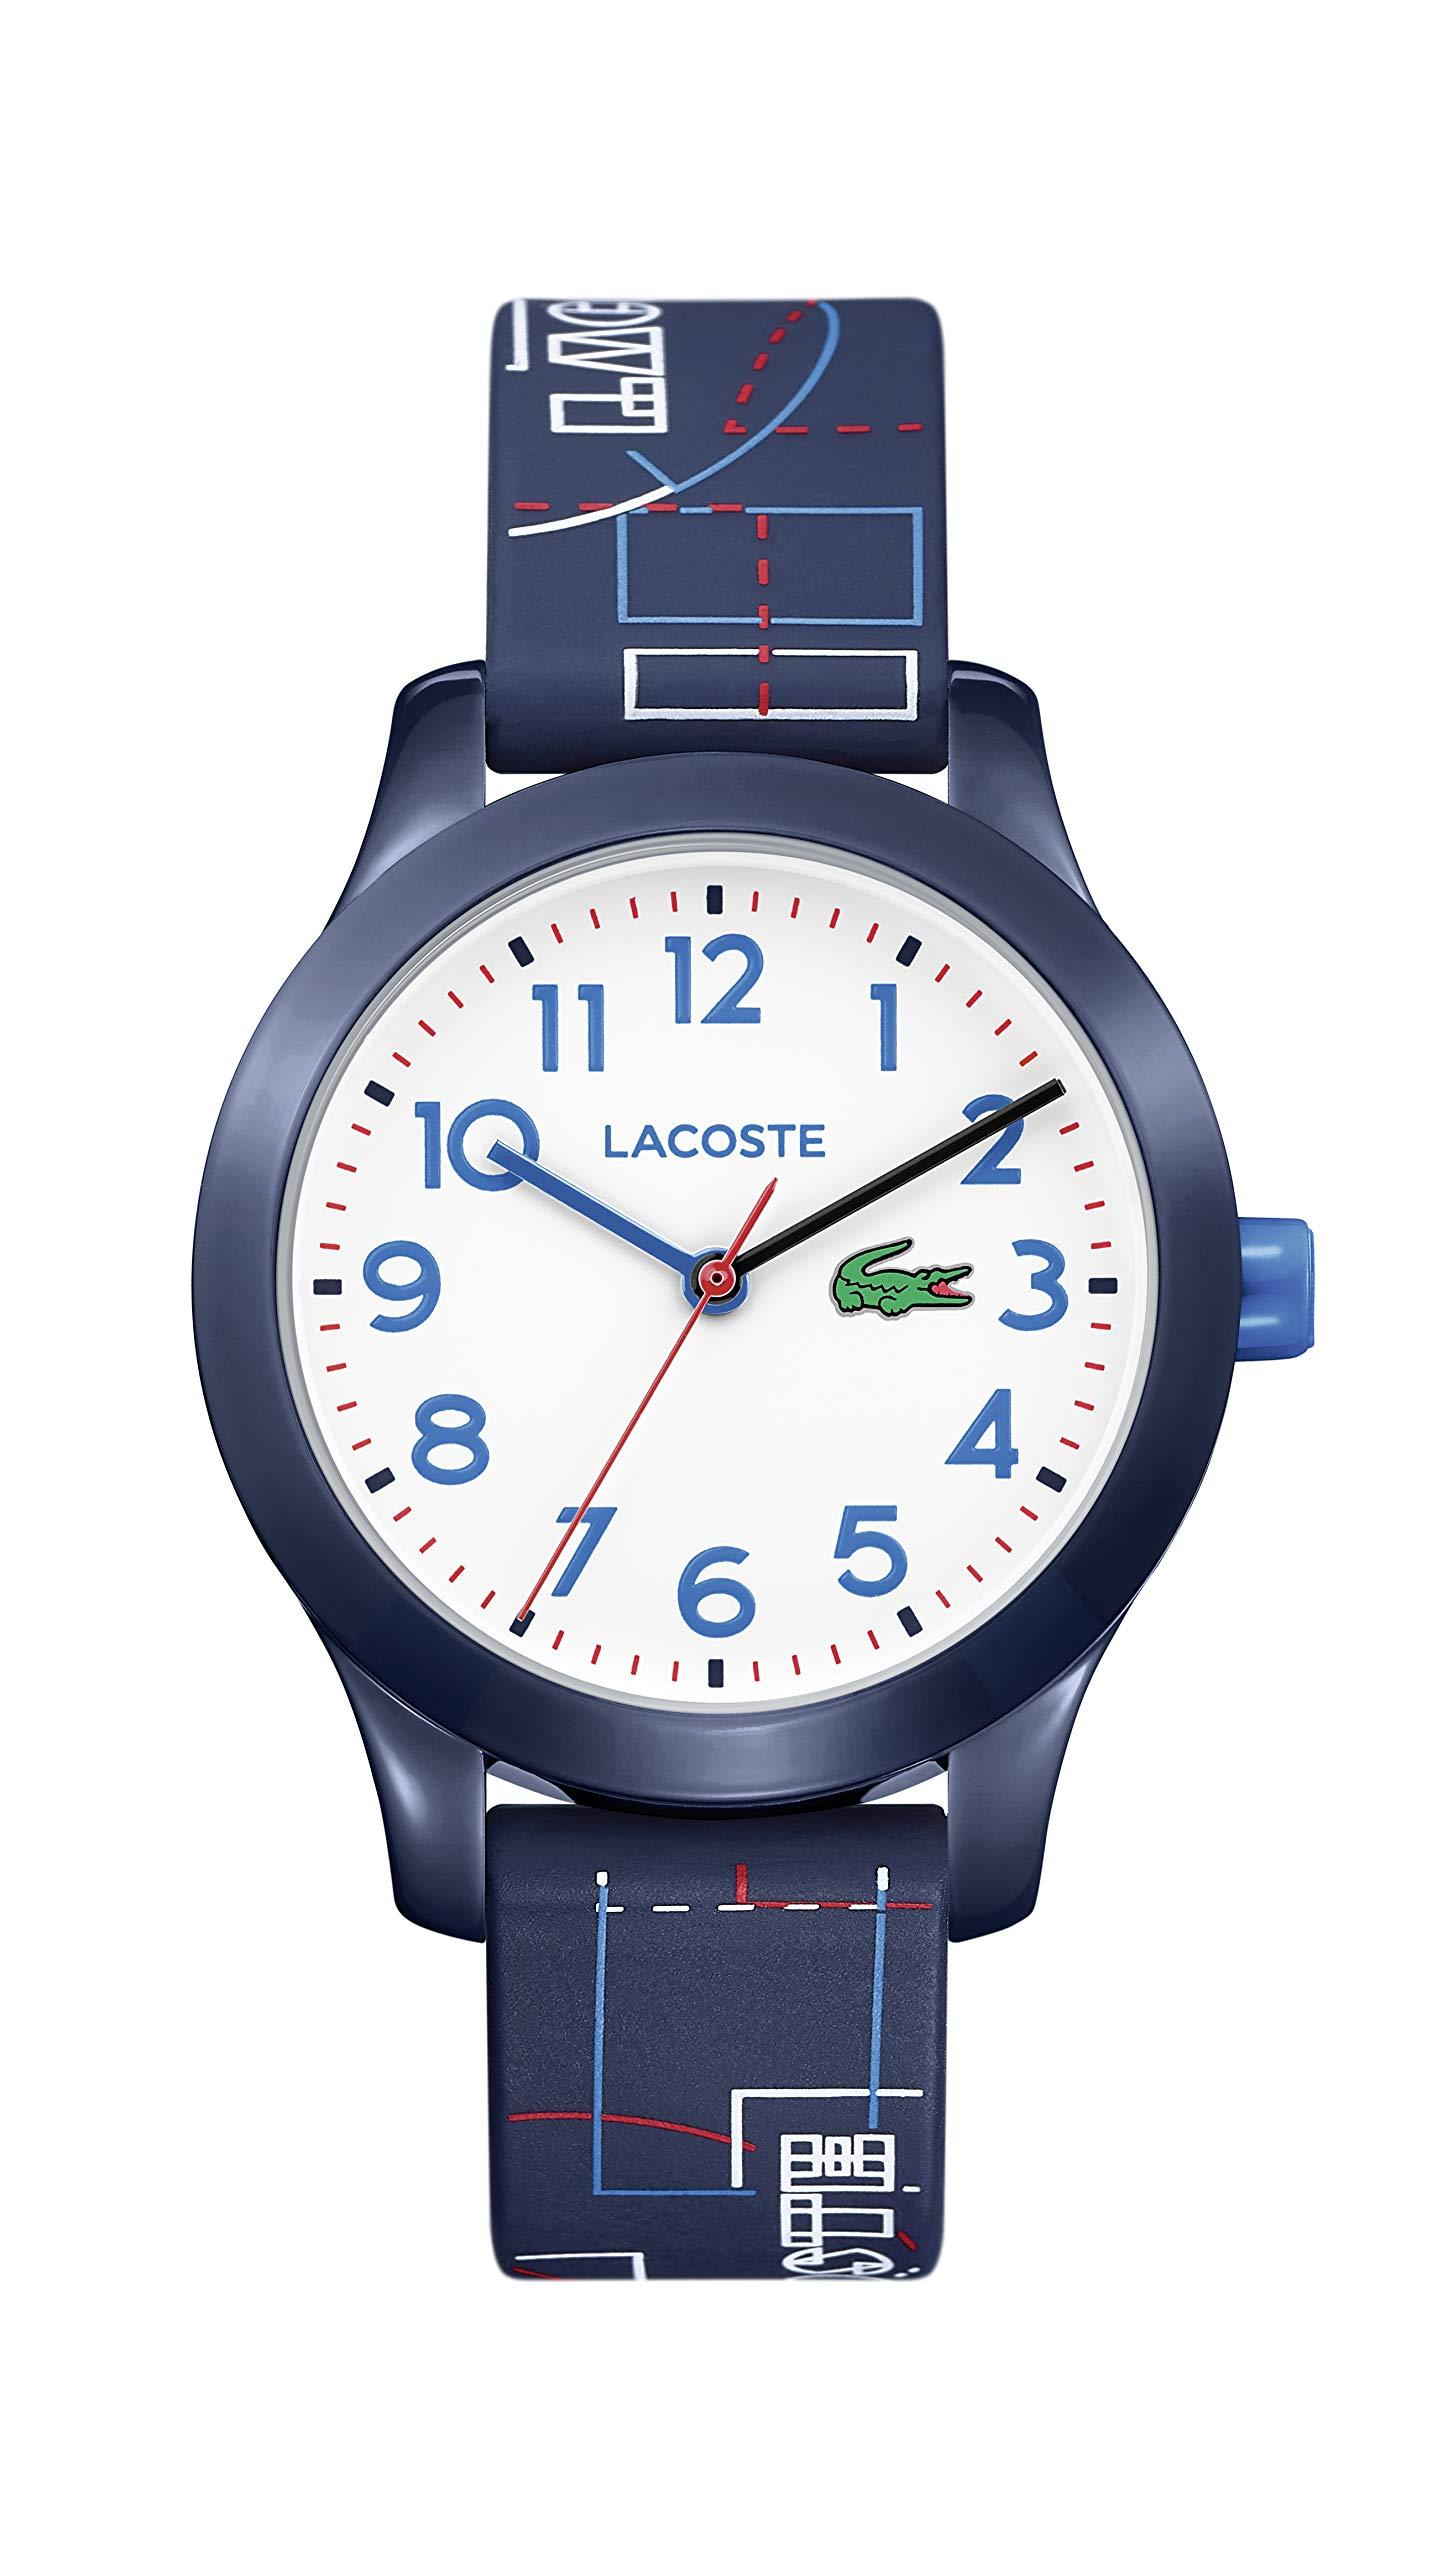 Lacoste Kids Lacoste.12.12 Kids Quartz TR-90 and Rubber Strap Casual Watch, Color: Blue (Model: 2030008)